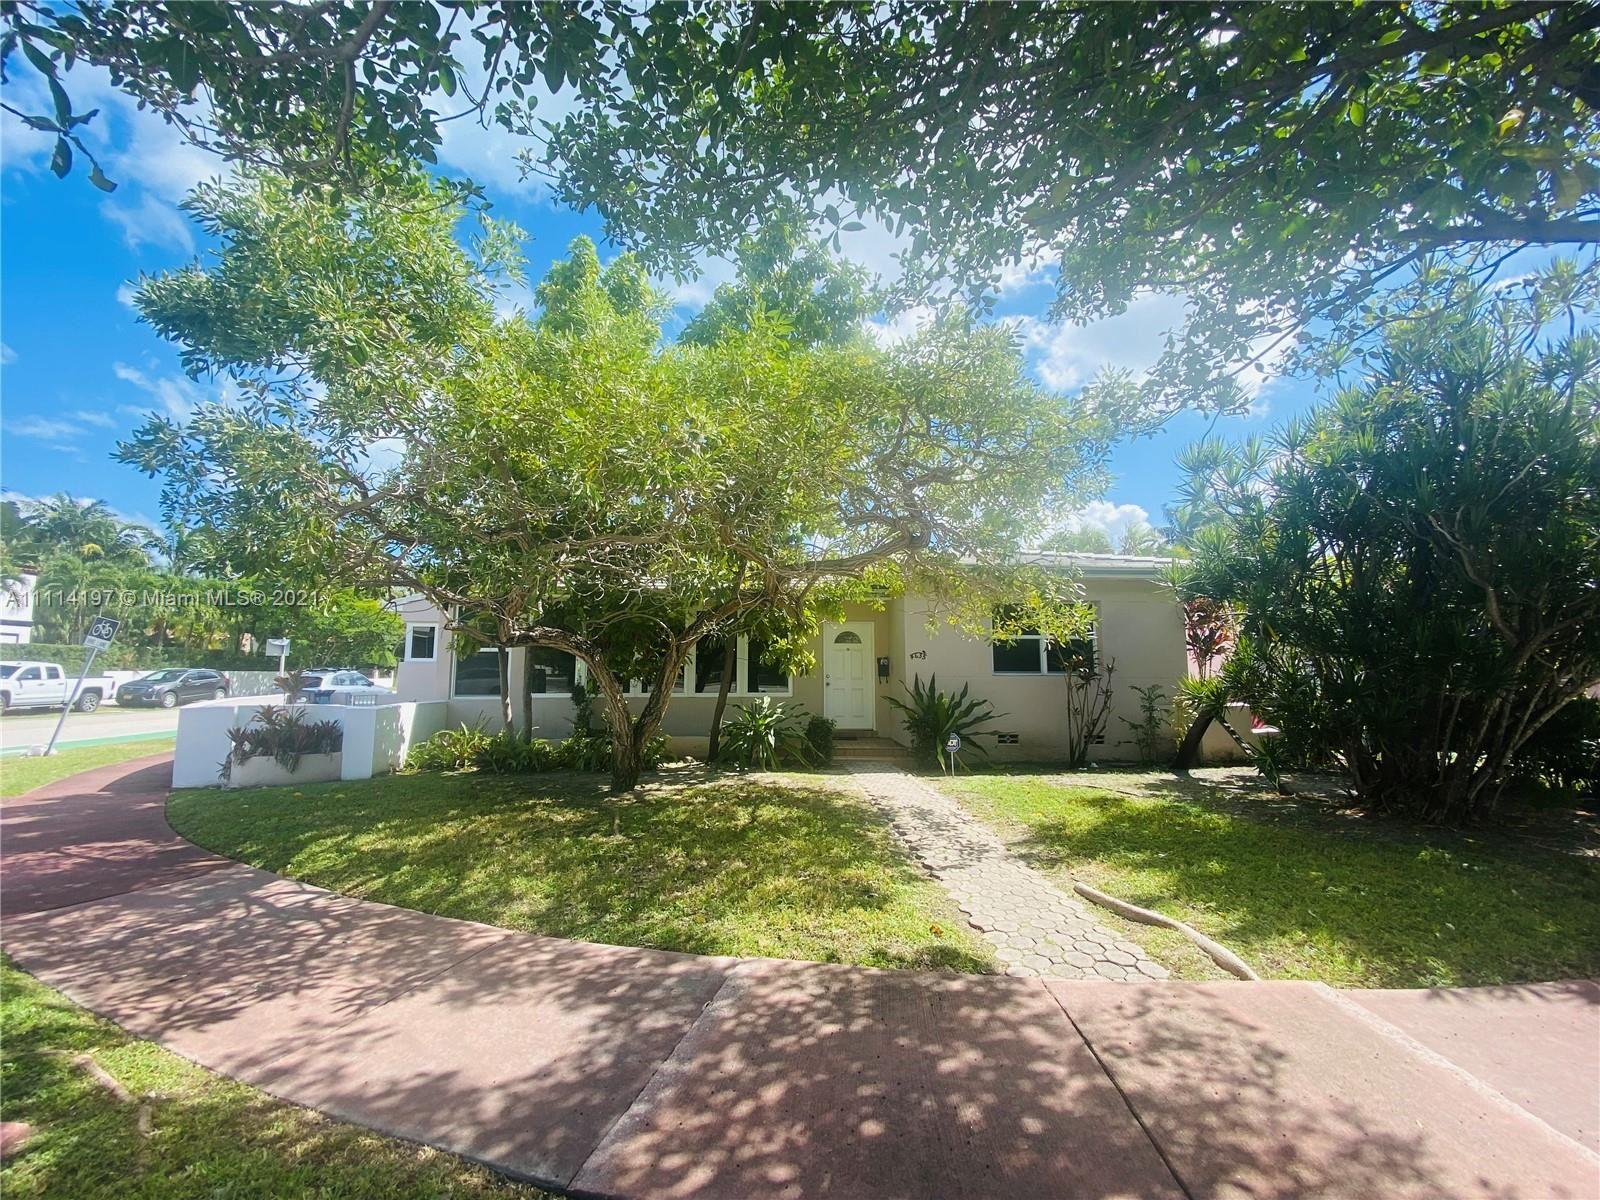 Photo of 4635 Alton Rd, Miami Beach, FL 33140 (MLS # A11114197)